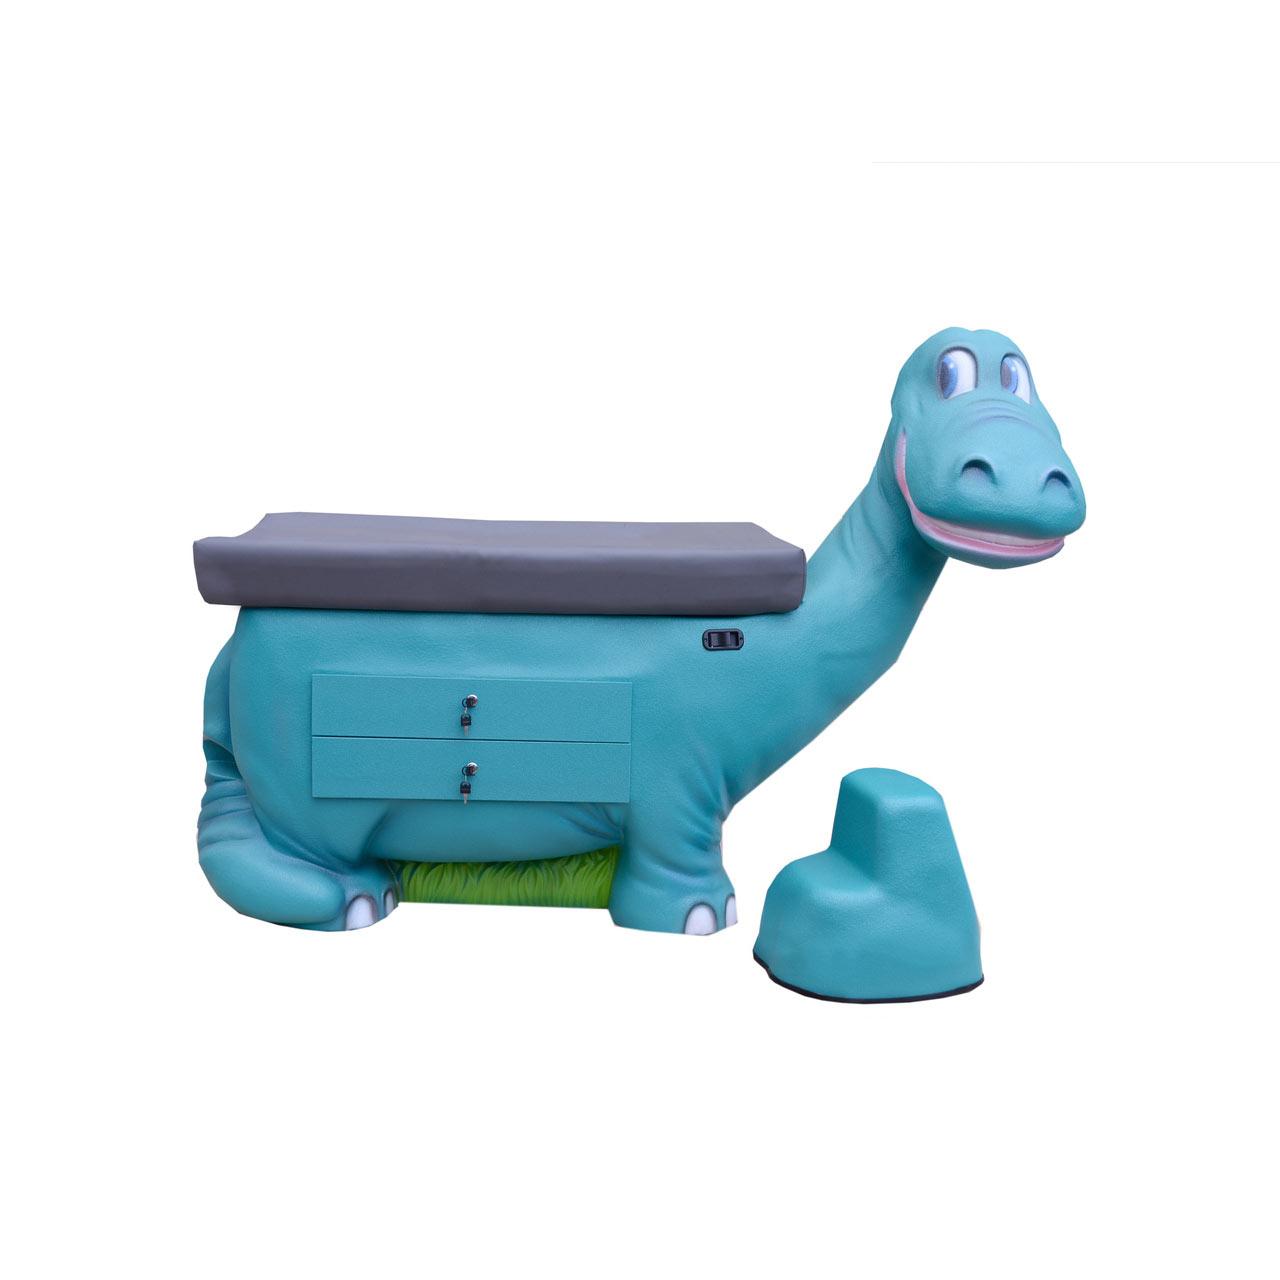 Pedia Pals Zoopal Dinosaur pediatric exam table